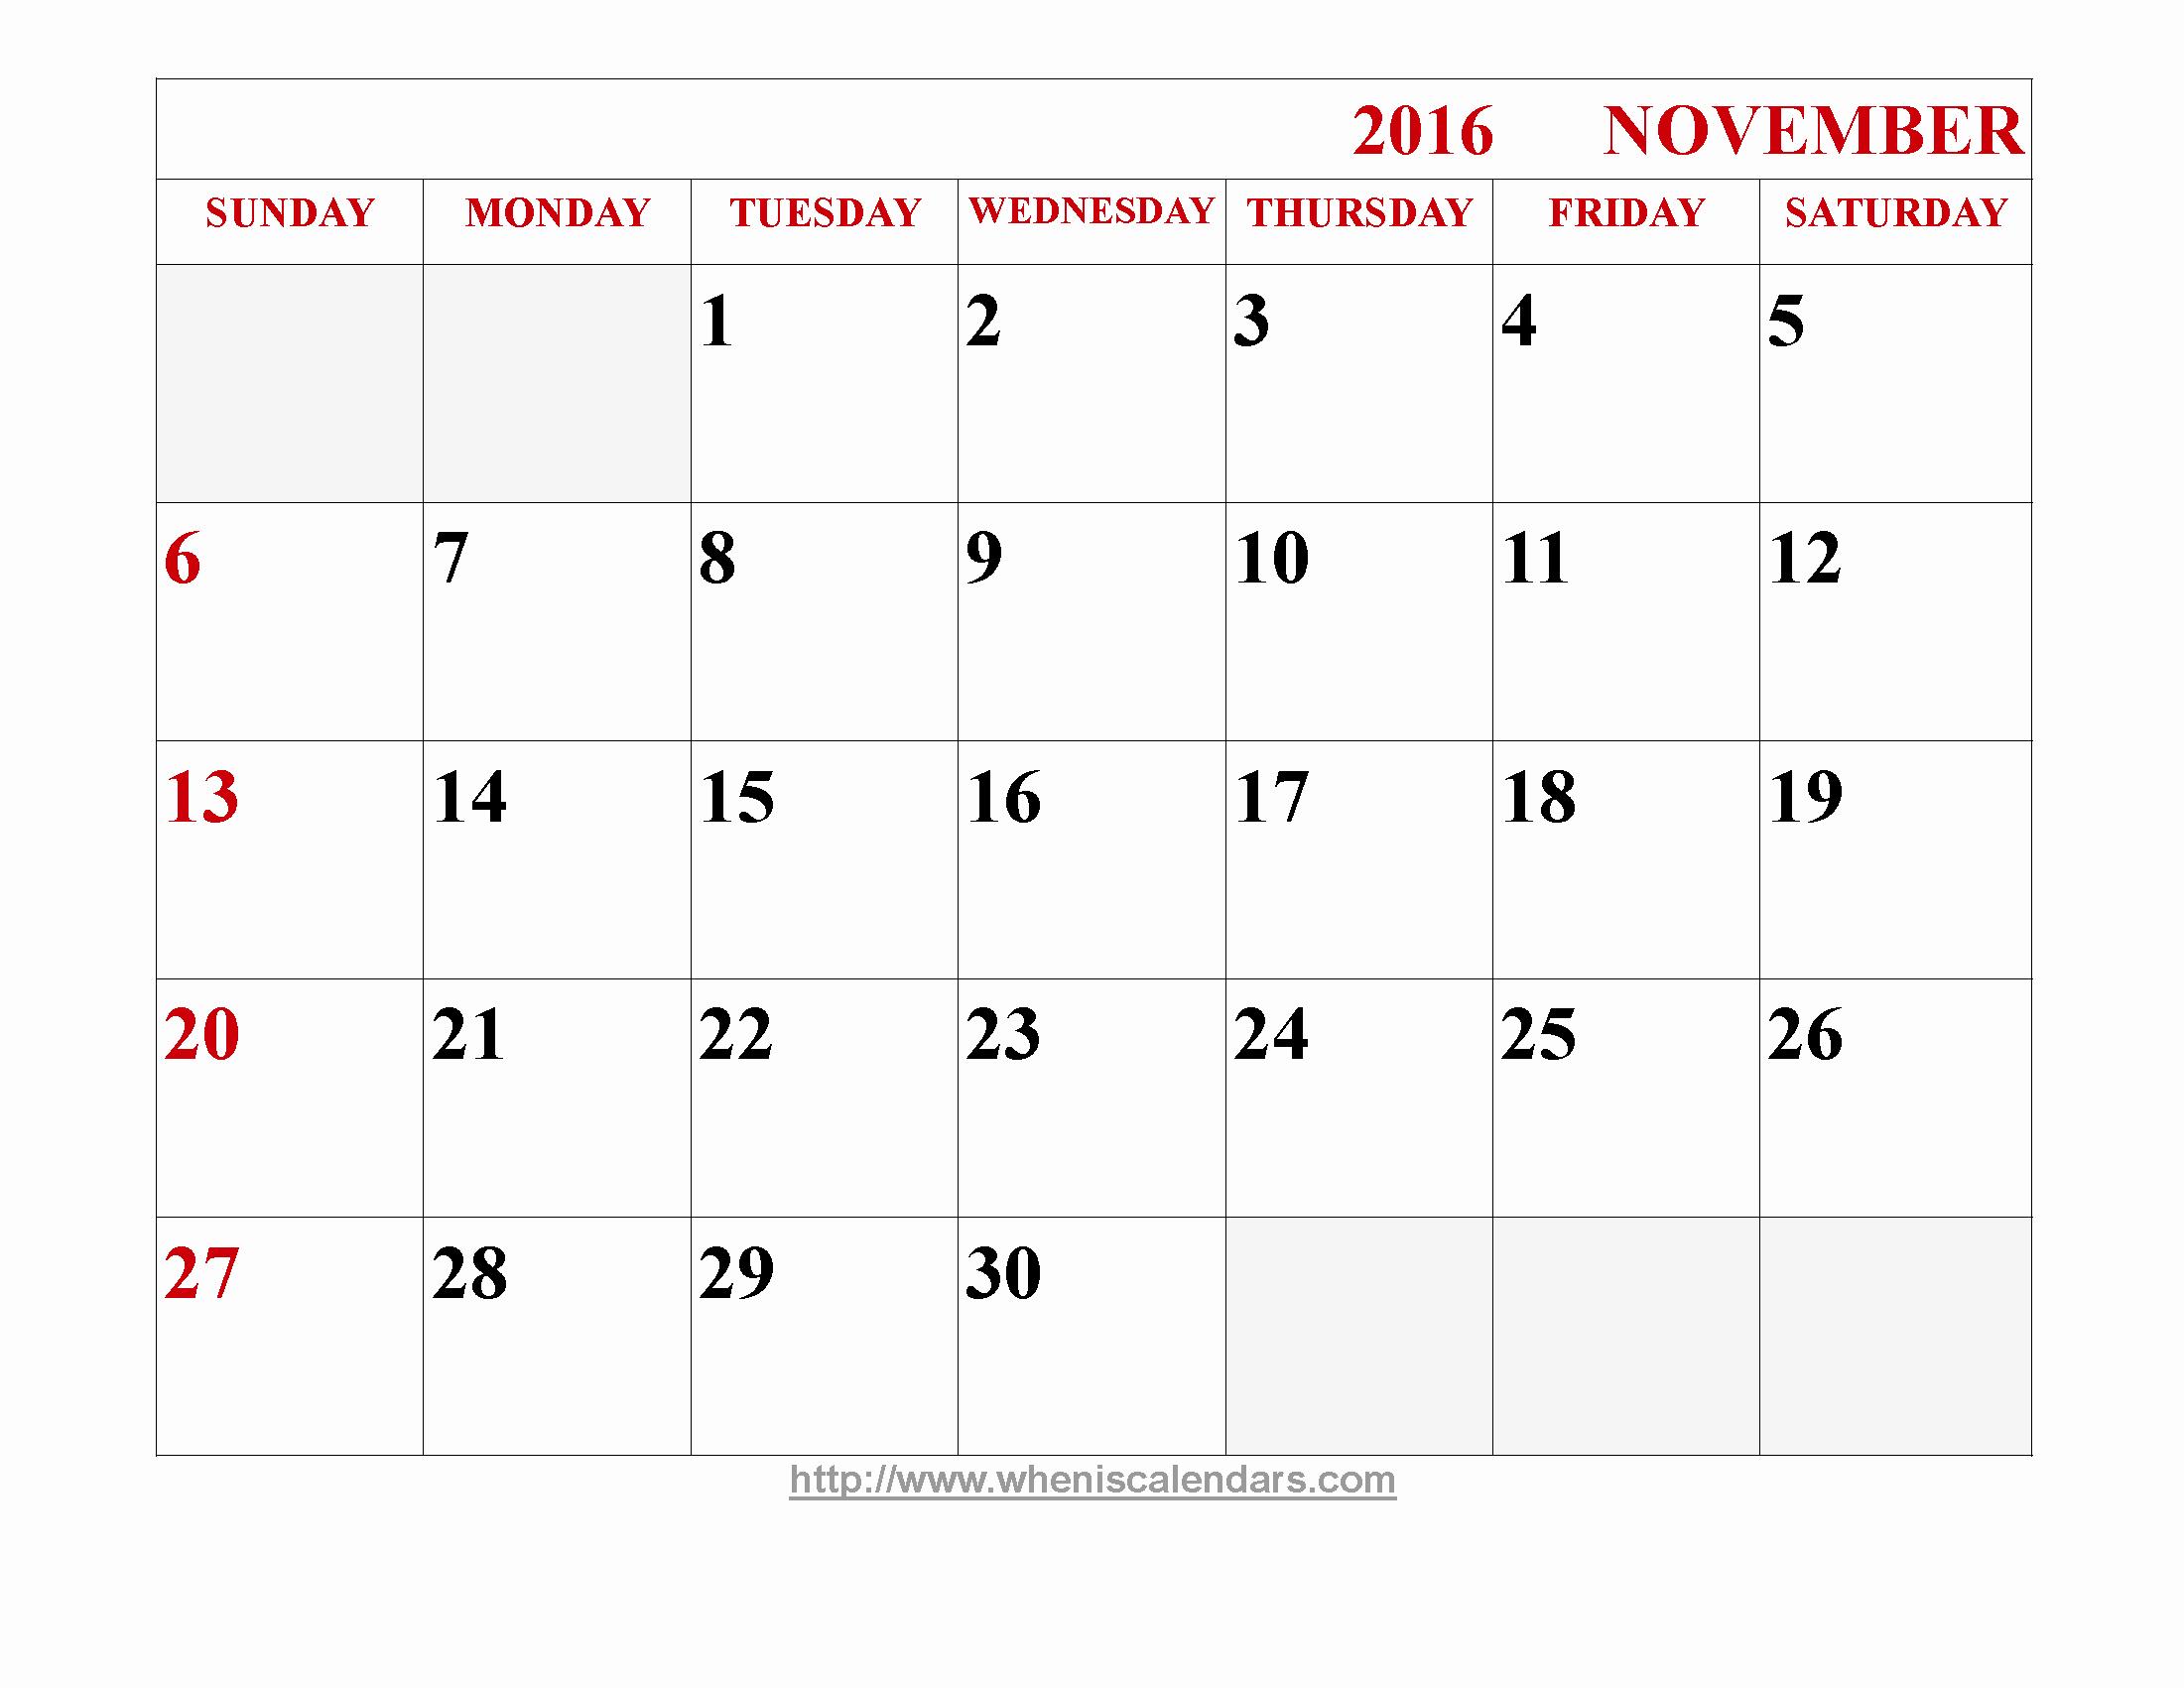 January 2016 Calendar Template Word Luxury Printable 2016 Calendar Template Word Printable 360 Degree